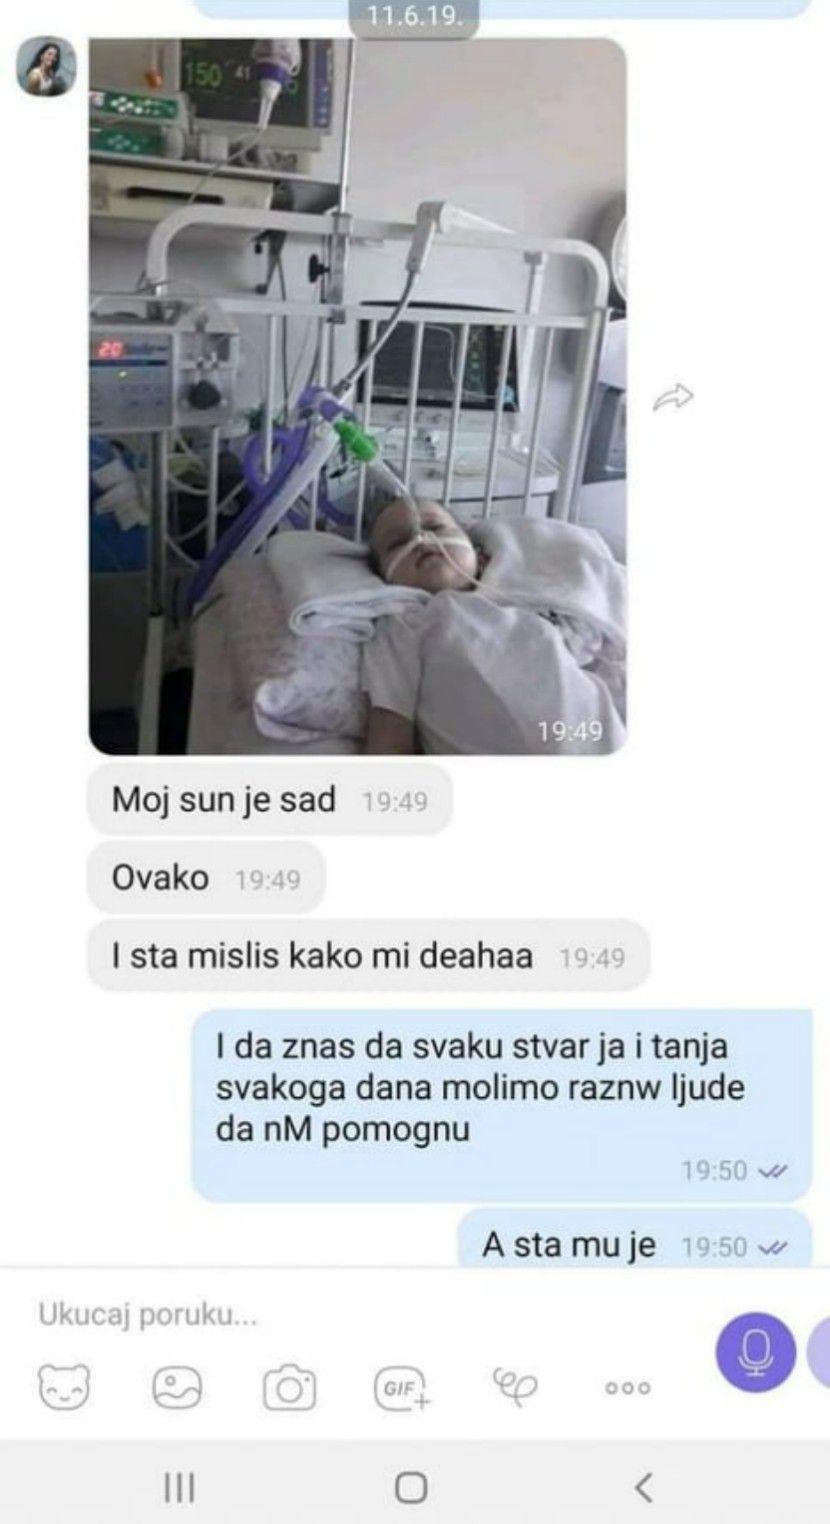 Snežana Jovanović, Verica Janković